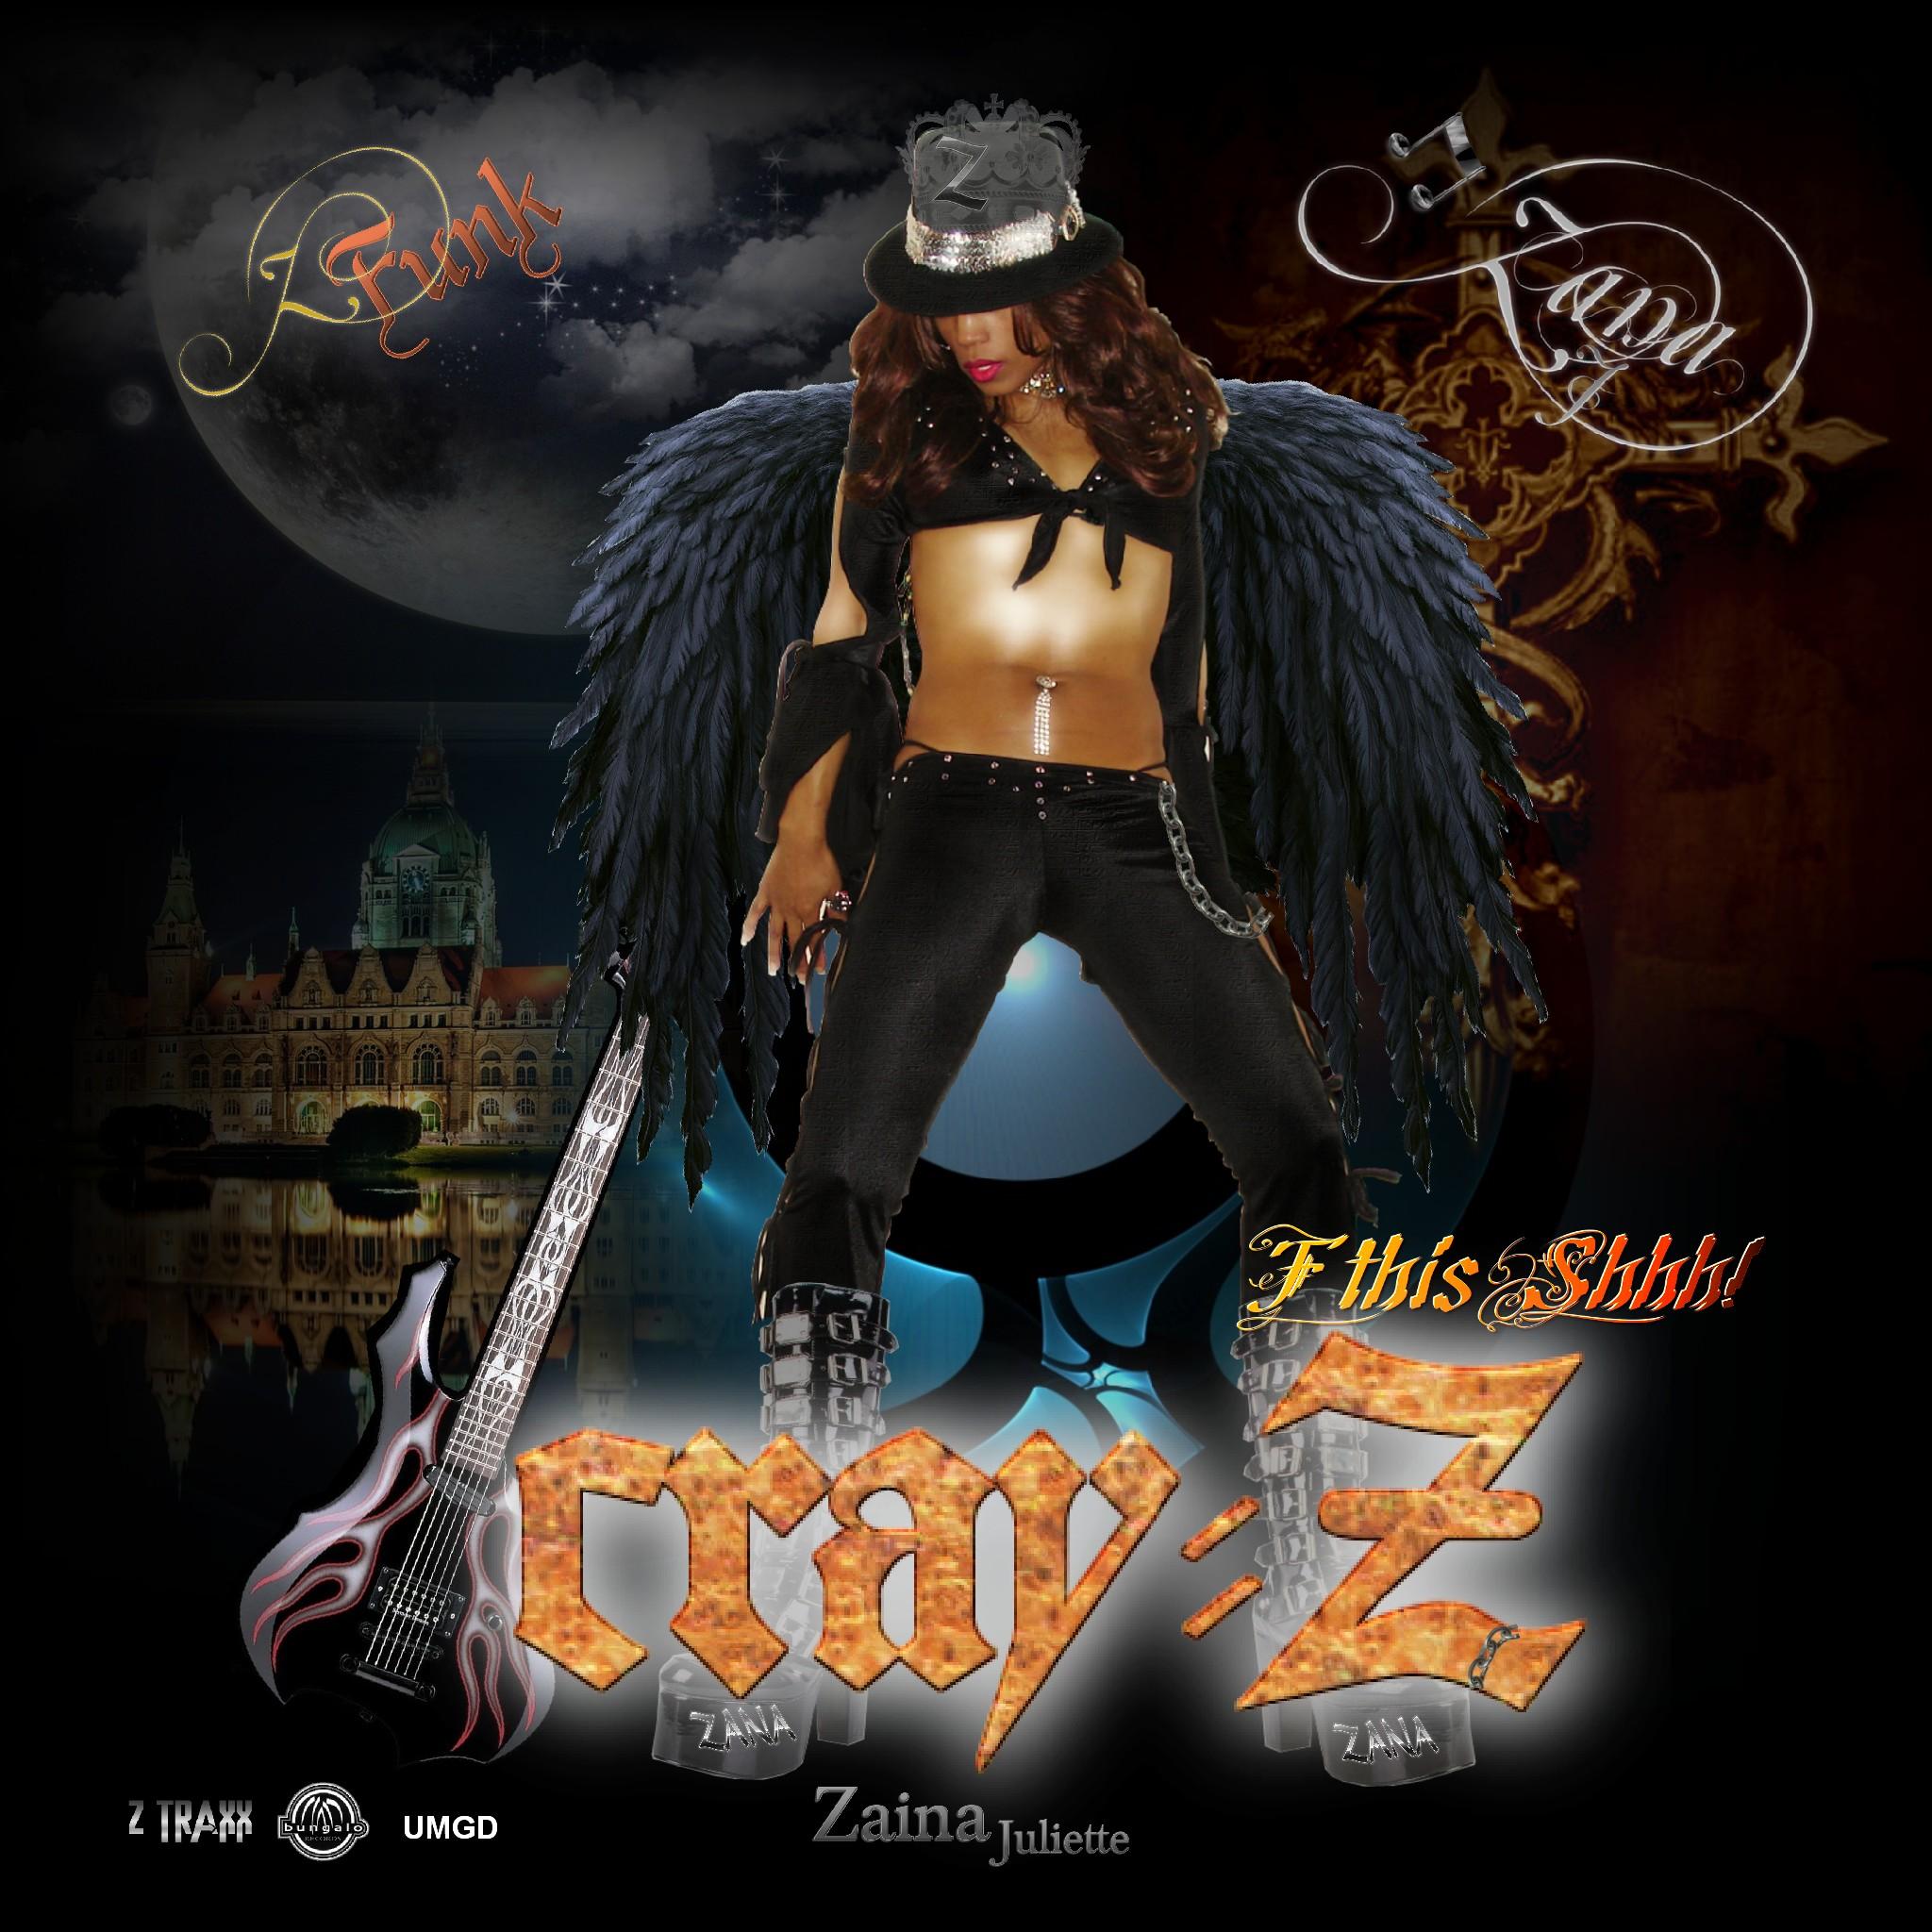 Crazy+CD+ccover1+444.jpg